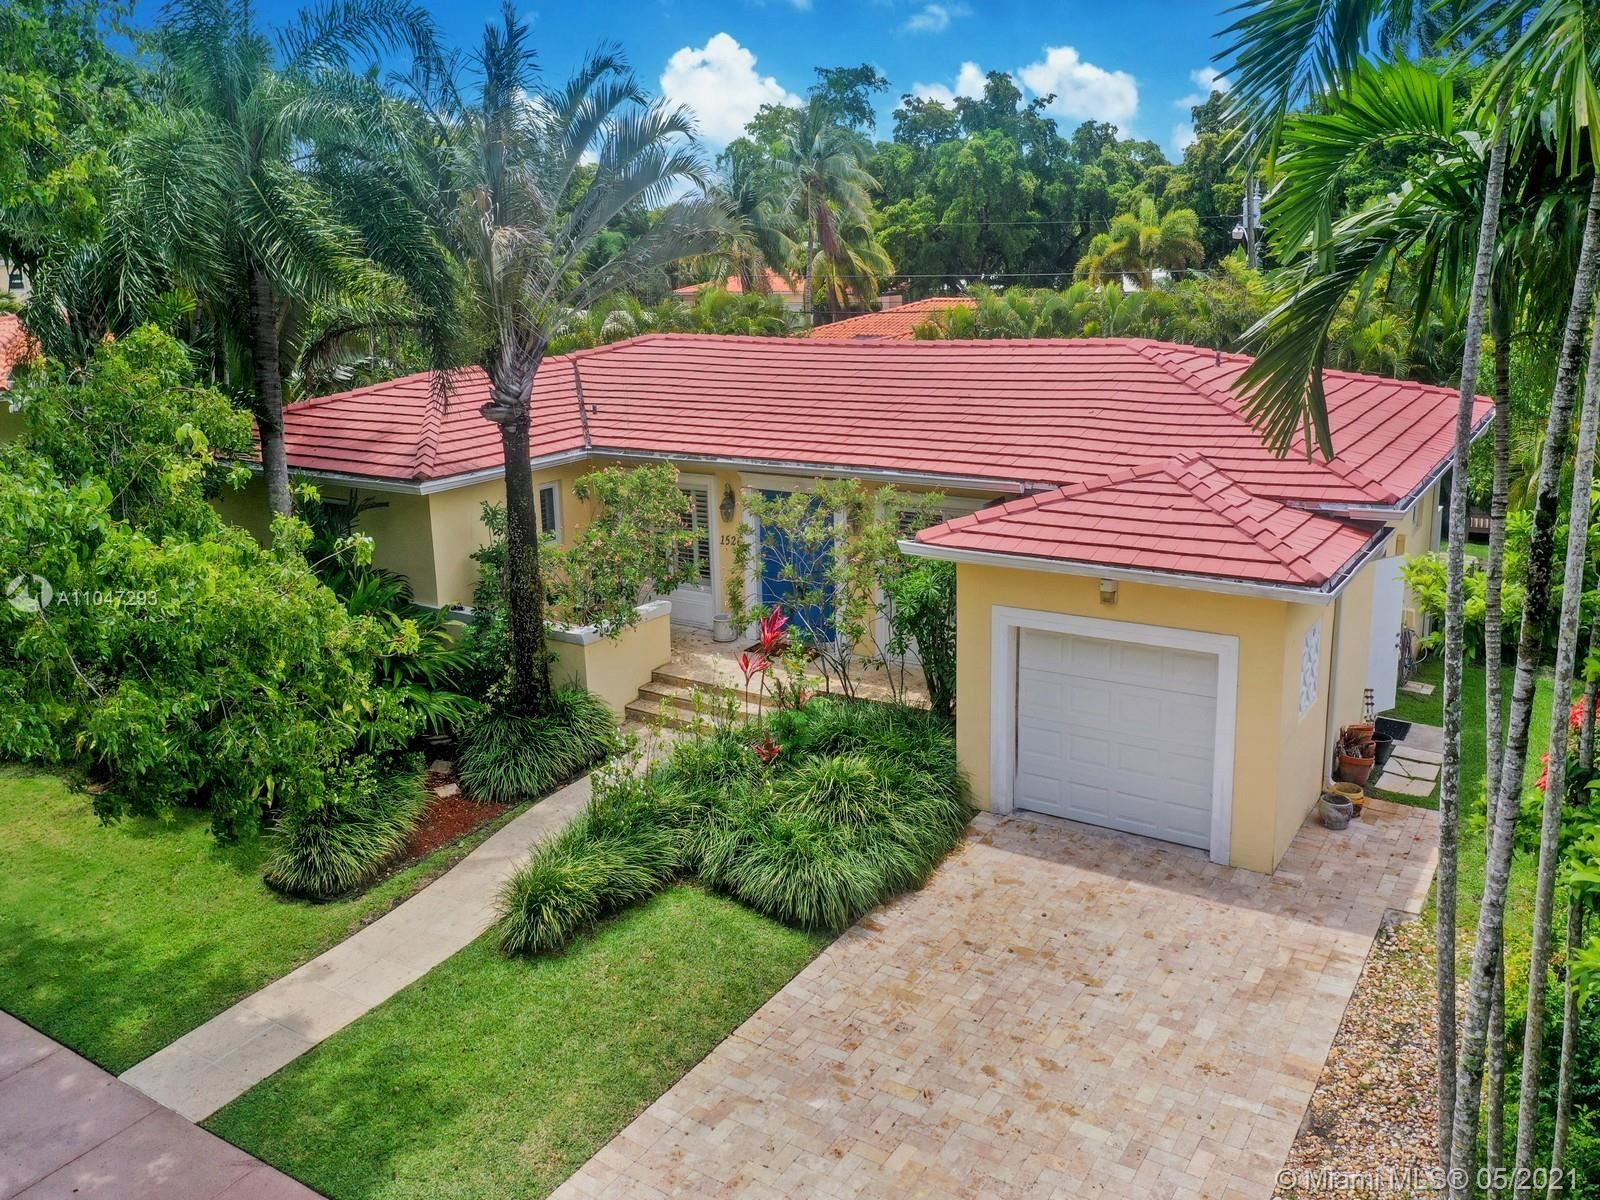 1526 Certosa Ave, Coral Gables, FL 33146 - #: A11047293